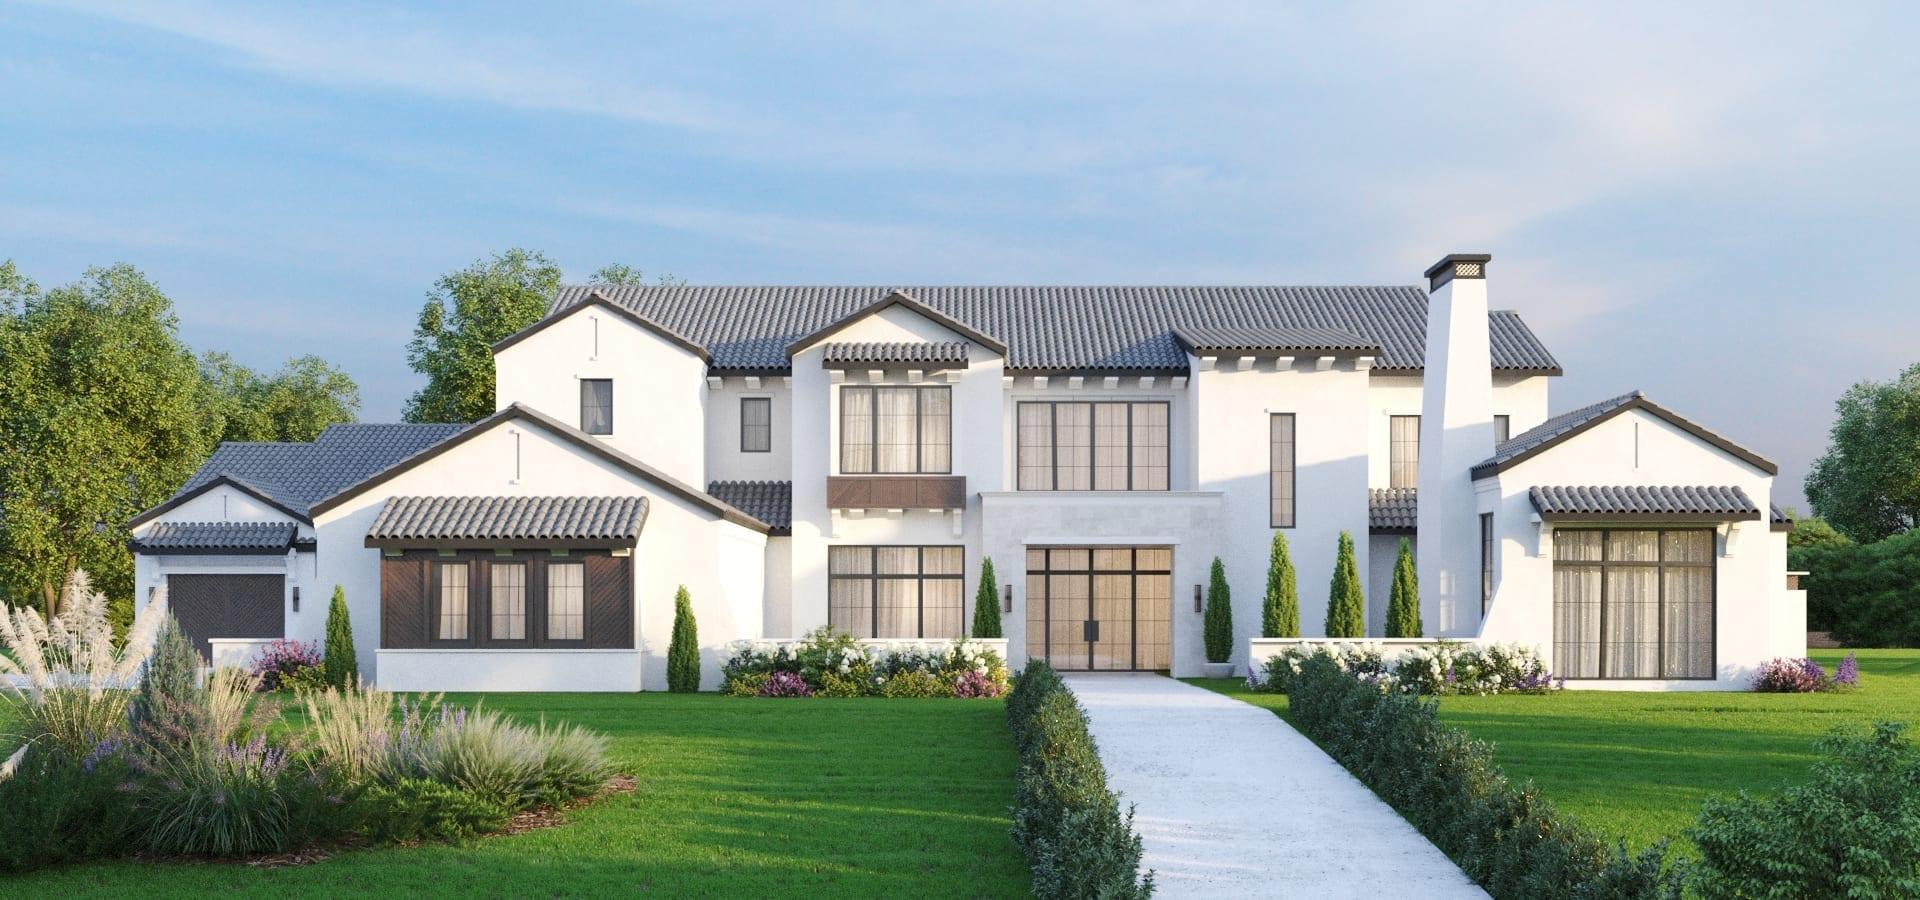 Modern Style Homes Dallas TX by Millennial Design + Build